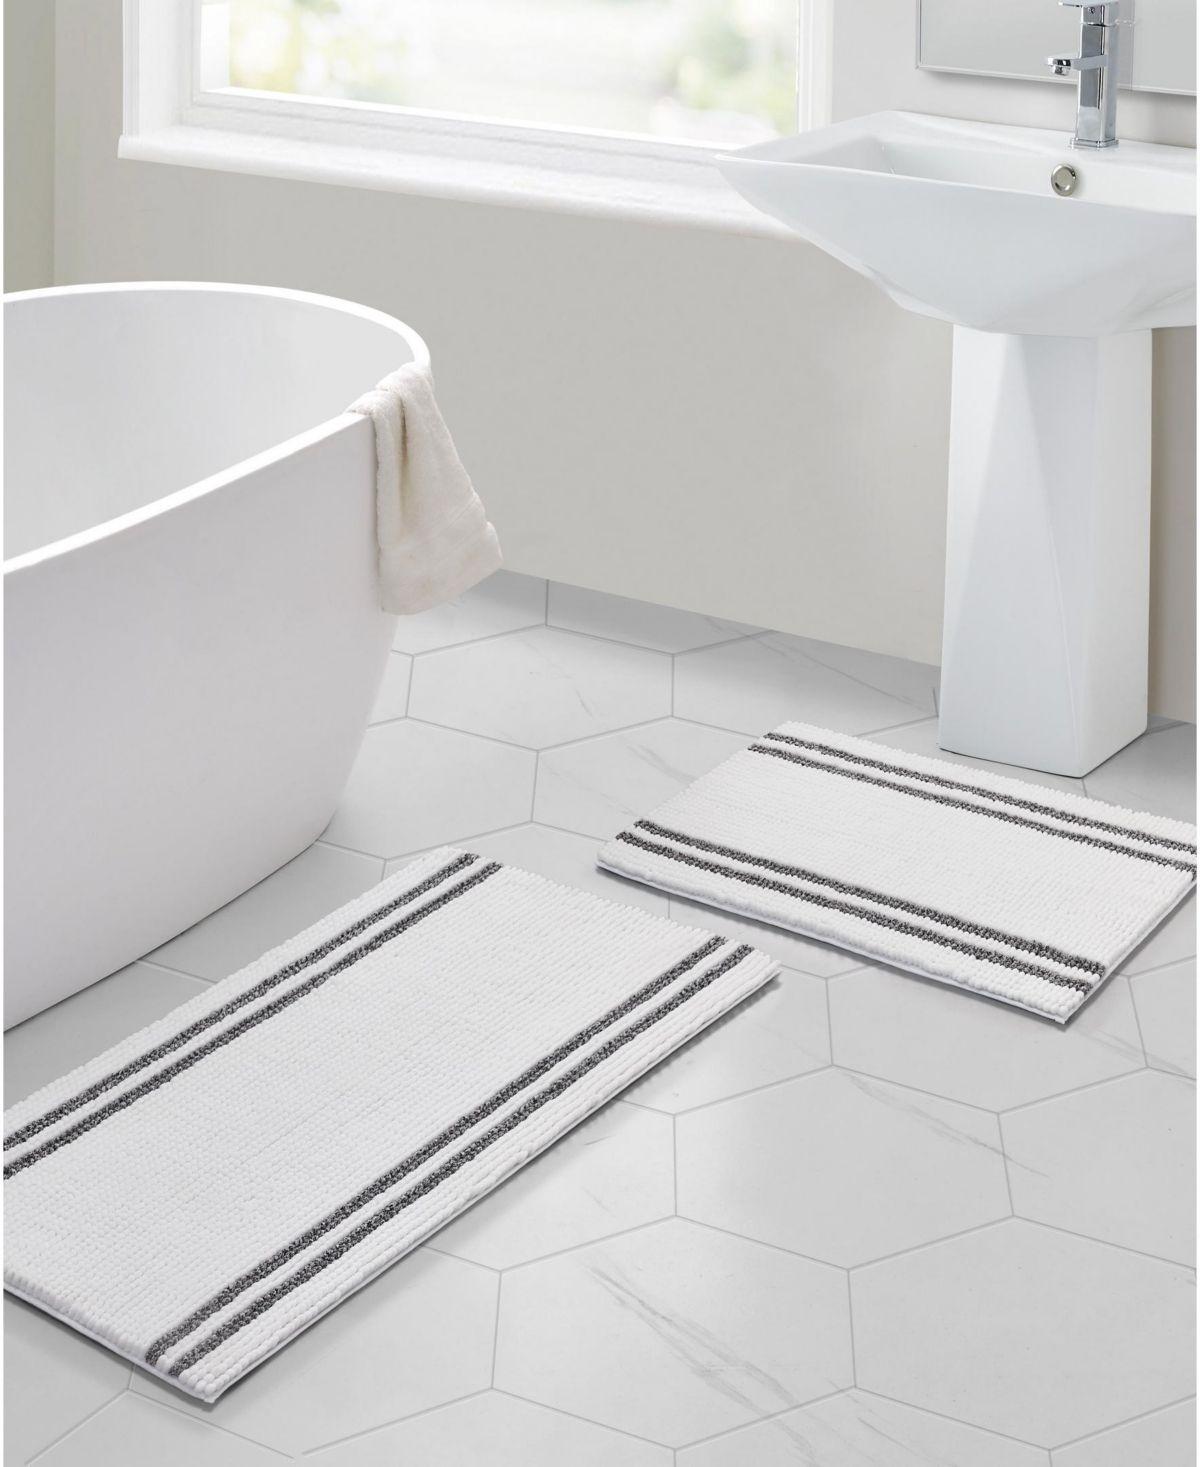 Vcny Home Stripe Noodle 2 Pc Bath Rug Set Bath Rugs Sets Small Bath Rugs Bath Rug [ 1467 x 1200 Pixel ]